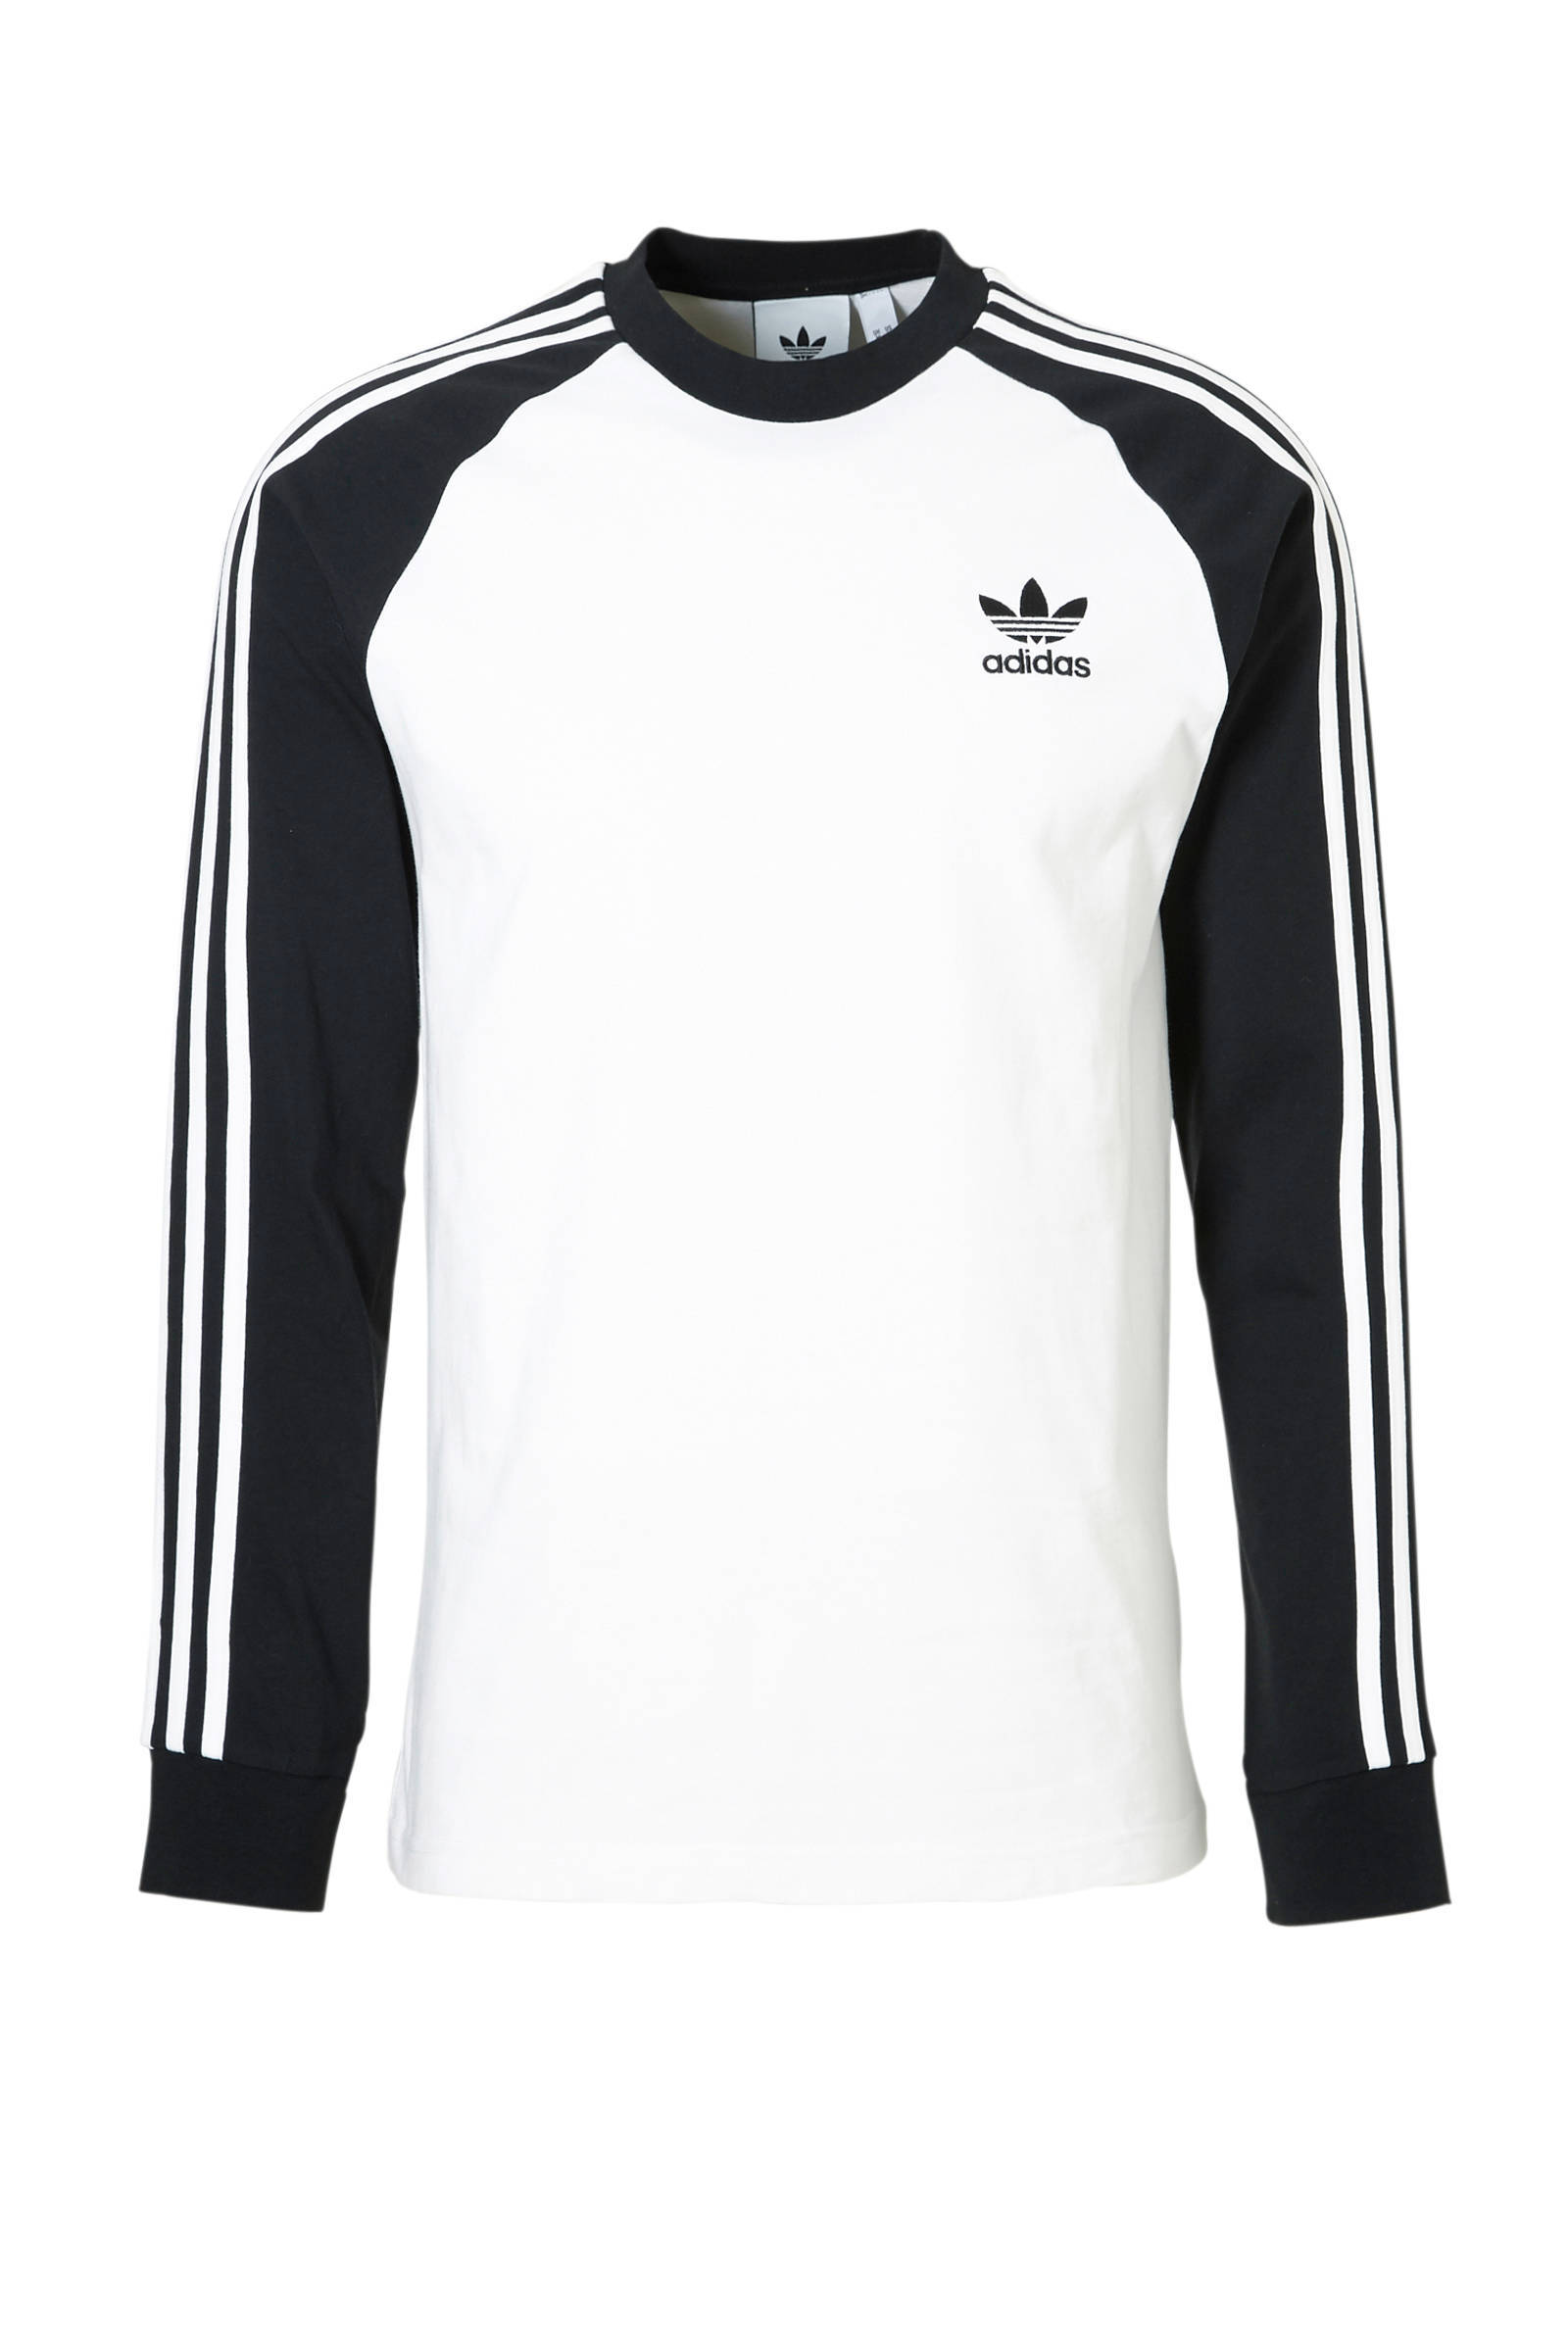 adidas Originals T-shirt wit/zwart | wehkamp